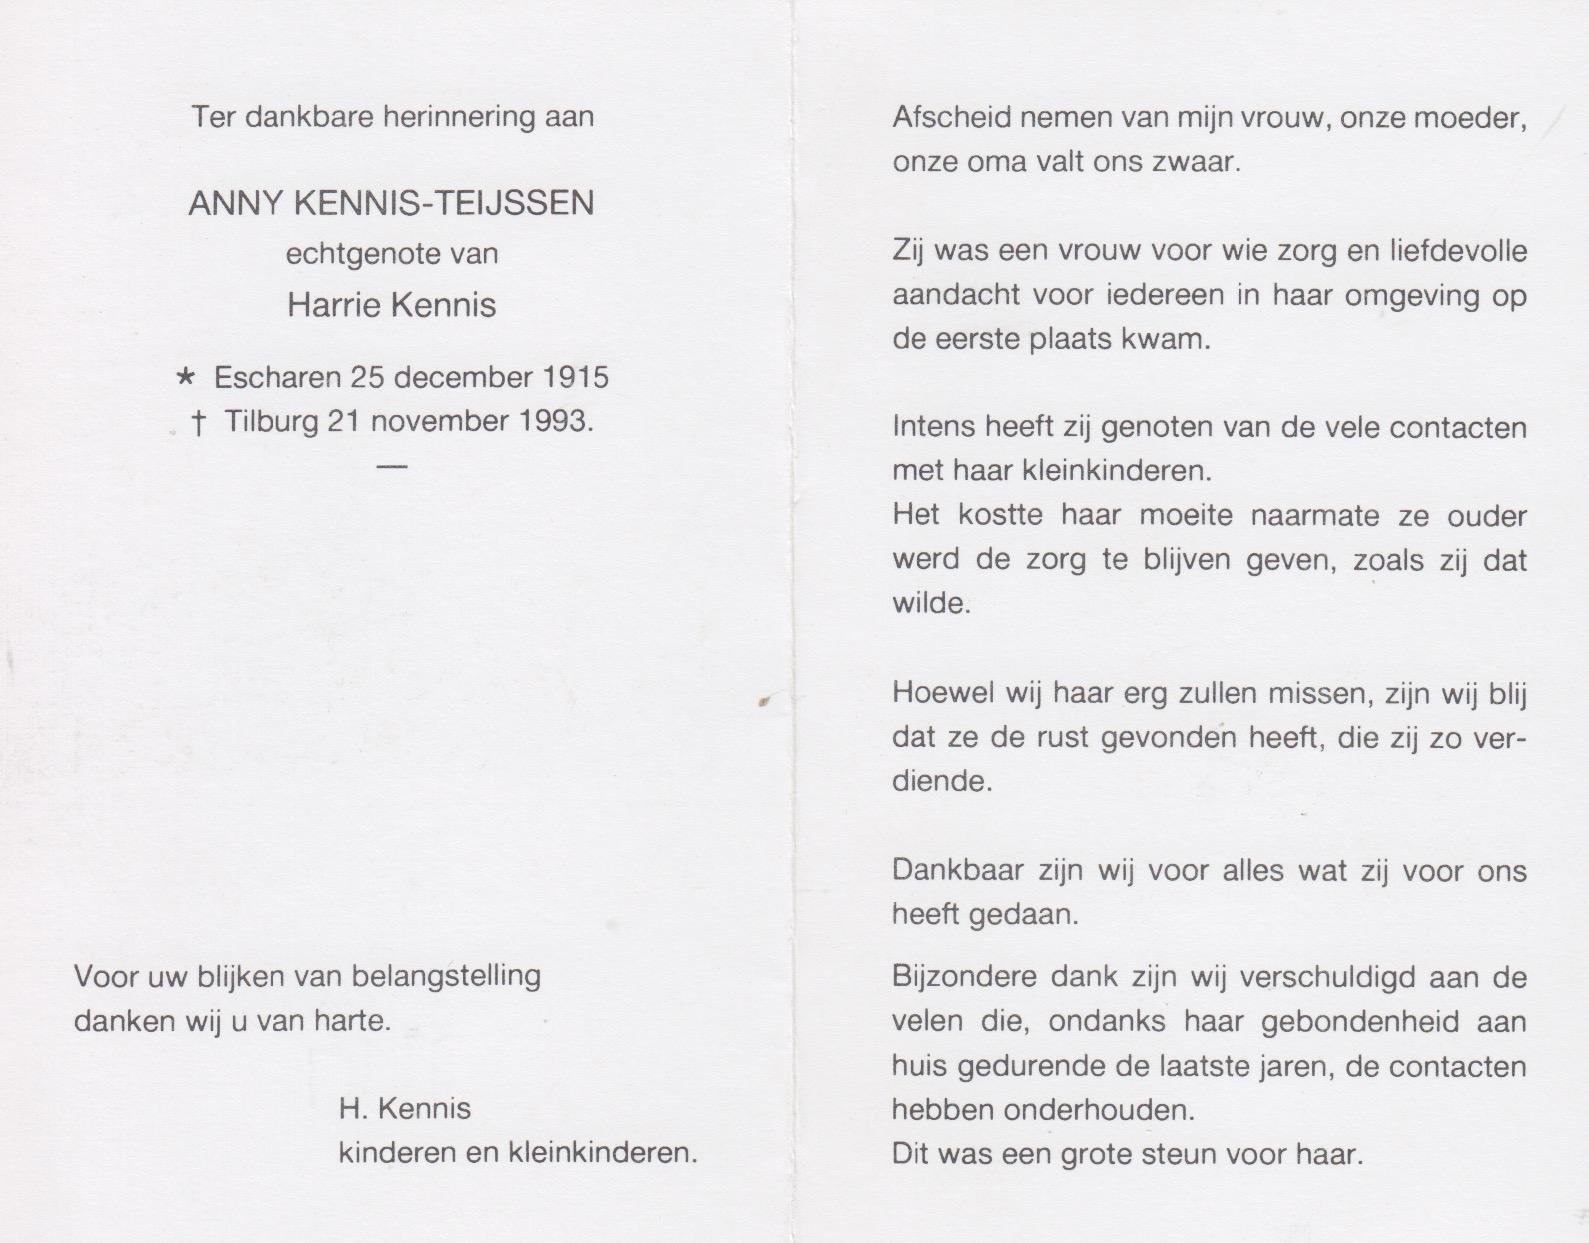 Bidprentje Anny Teijssen